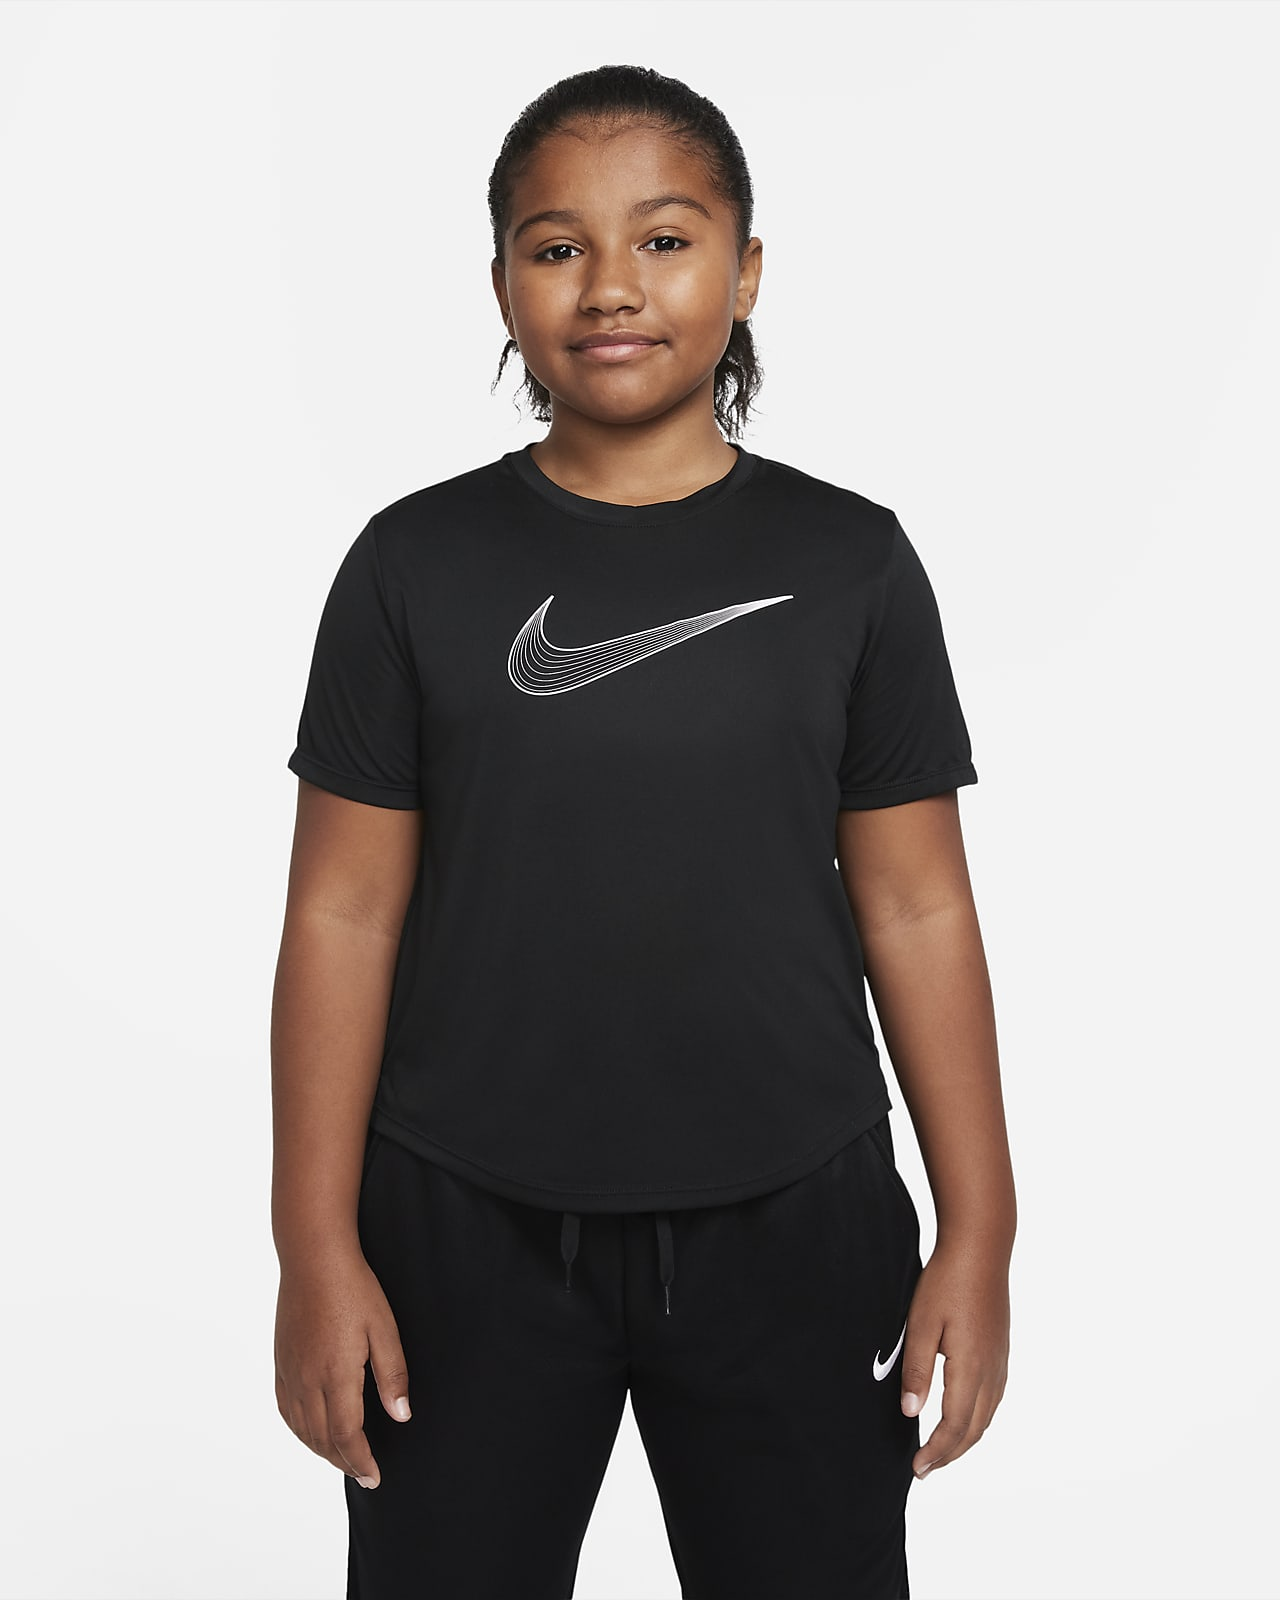 Nike Dri-FIT One Kurzarm-Trainingsoberteil für ältere Kinder (Mädchen) (große Größe)